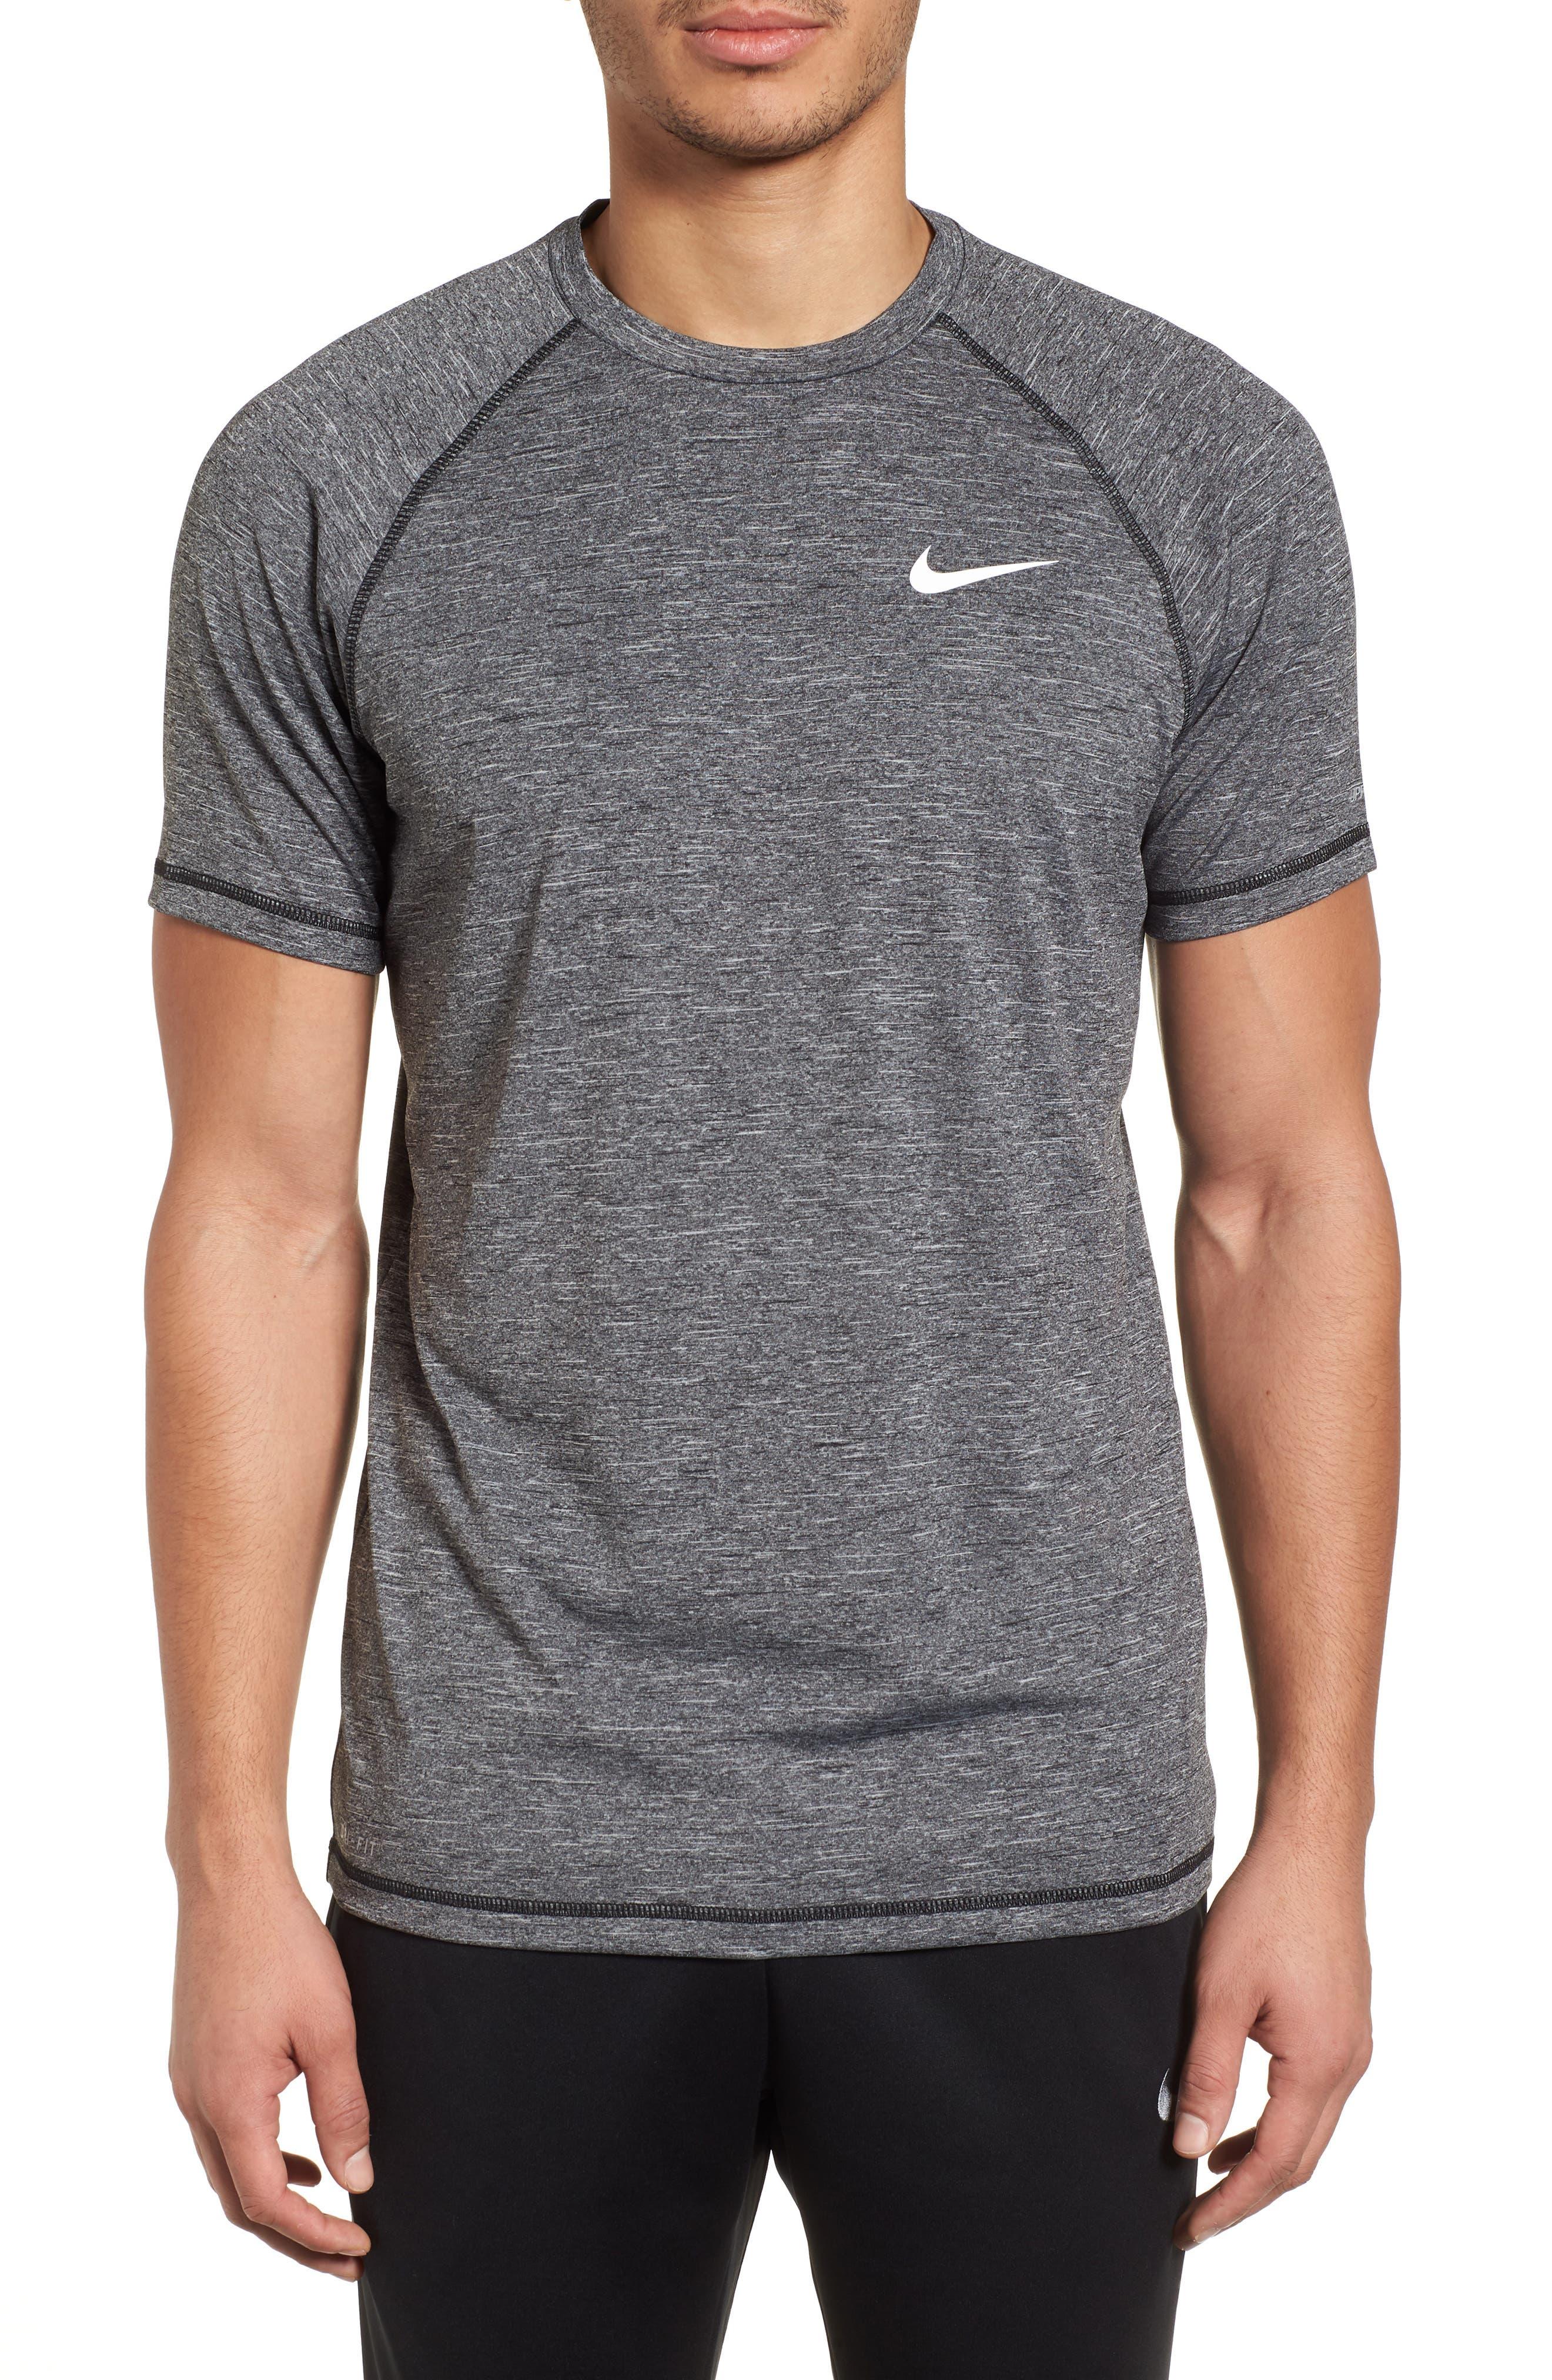 Nike Dry Hydroguard T-Shirt, Black